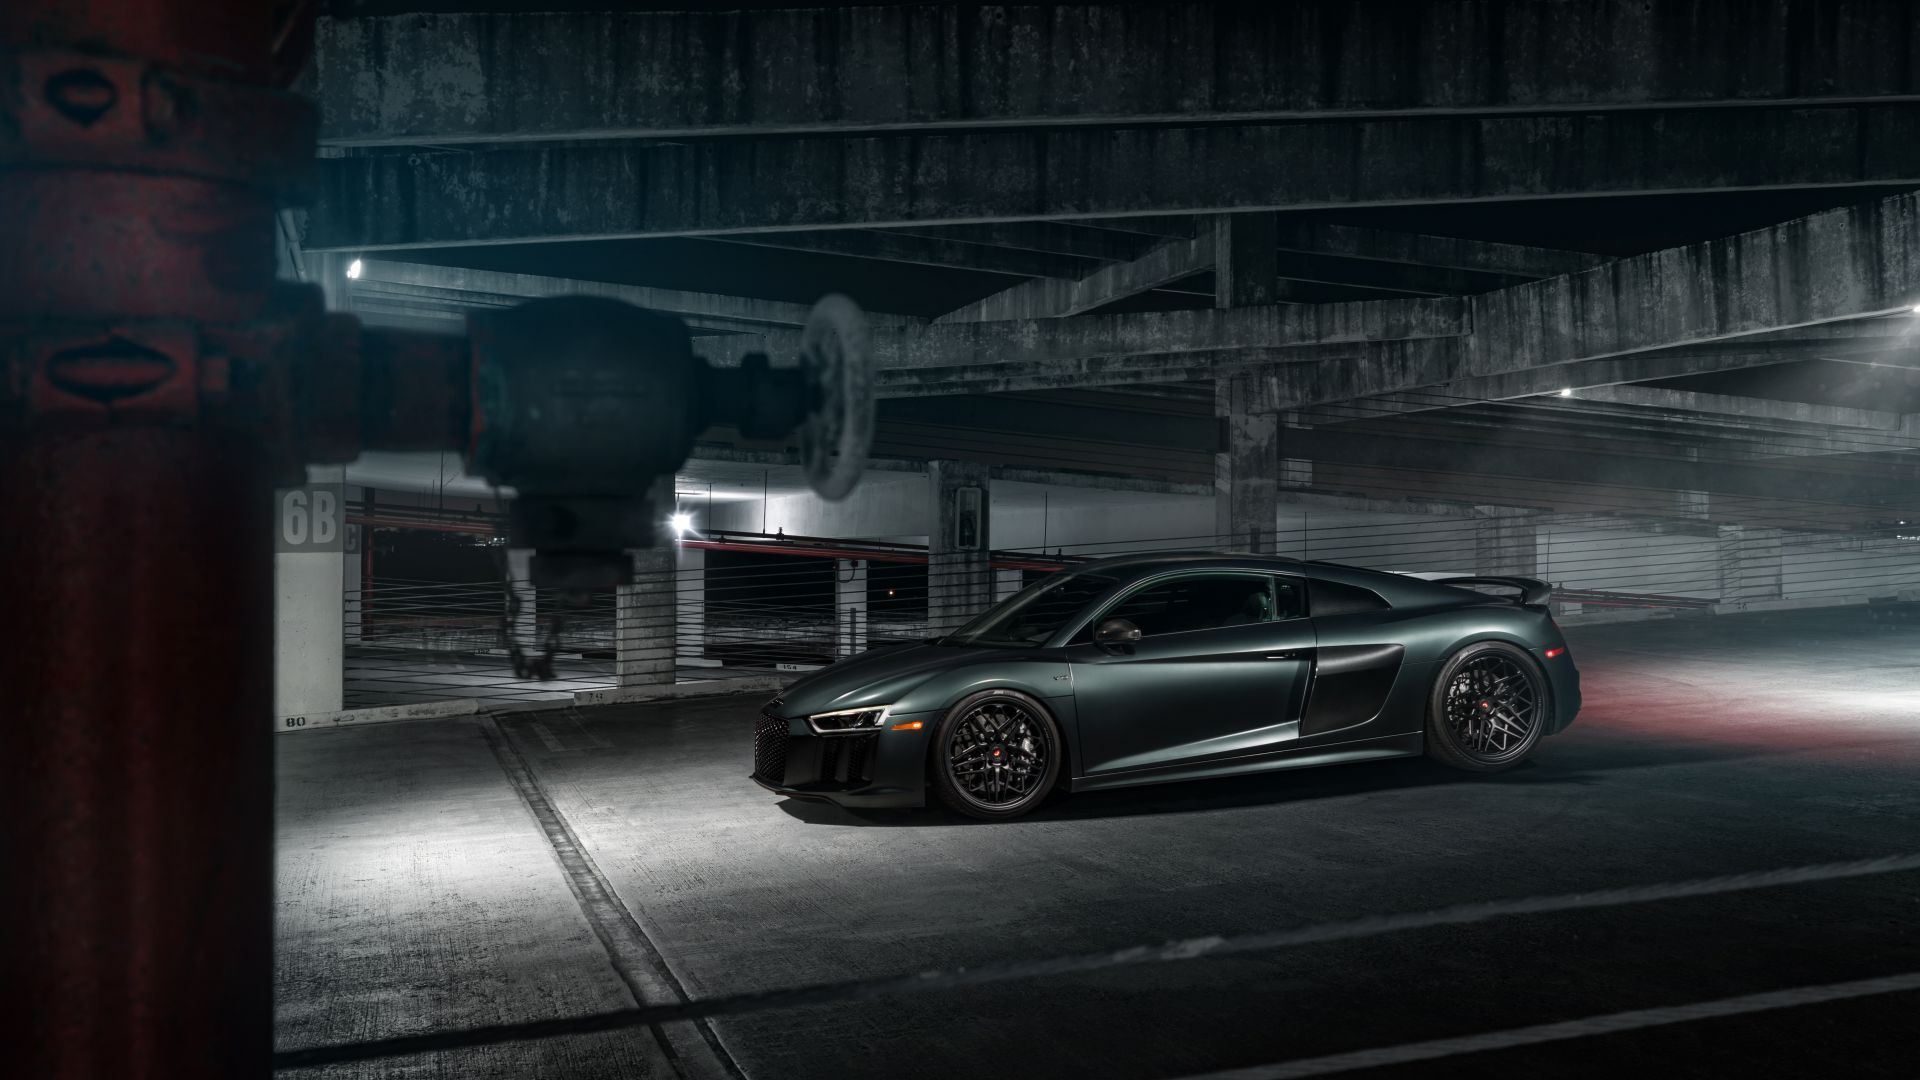 Awe Inspiring 2018 Audi R8 V10 8k Hd Wallpapers Cars Wallpapers